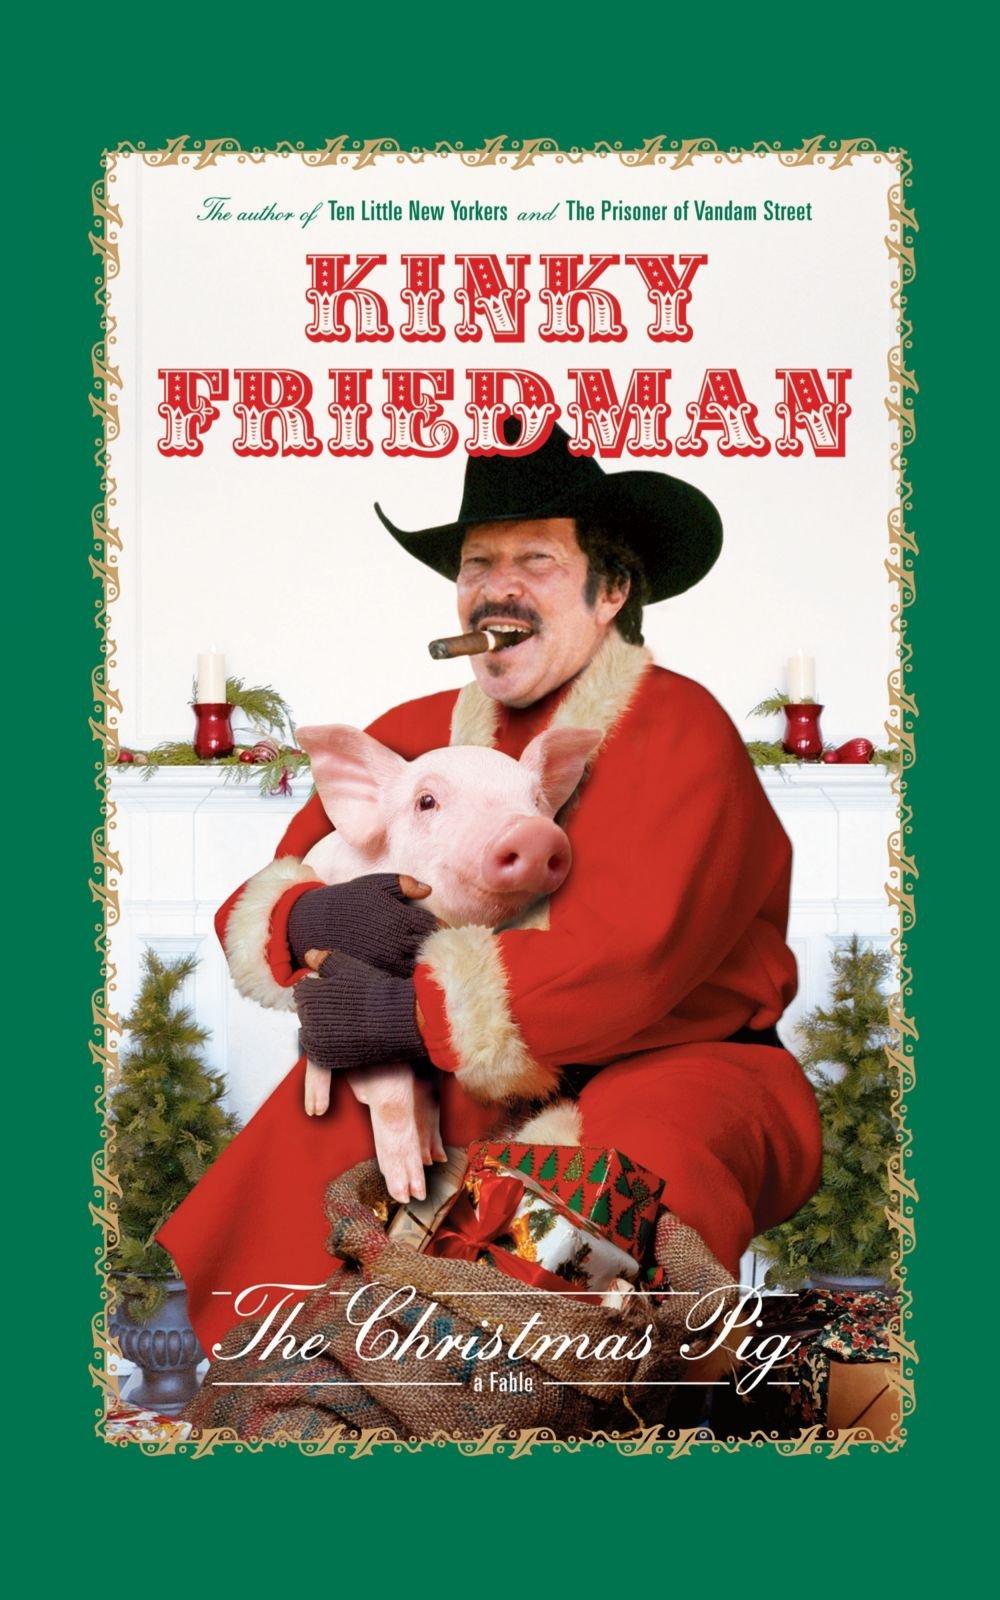 The Christmas Pig: A Fable: Kinky Friedman: 9781451643381: Amazon ...